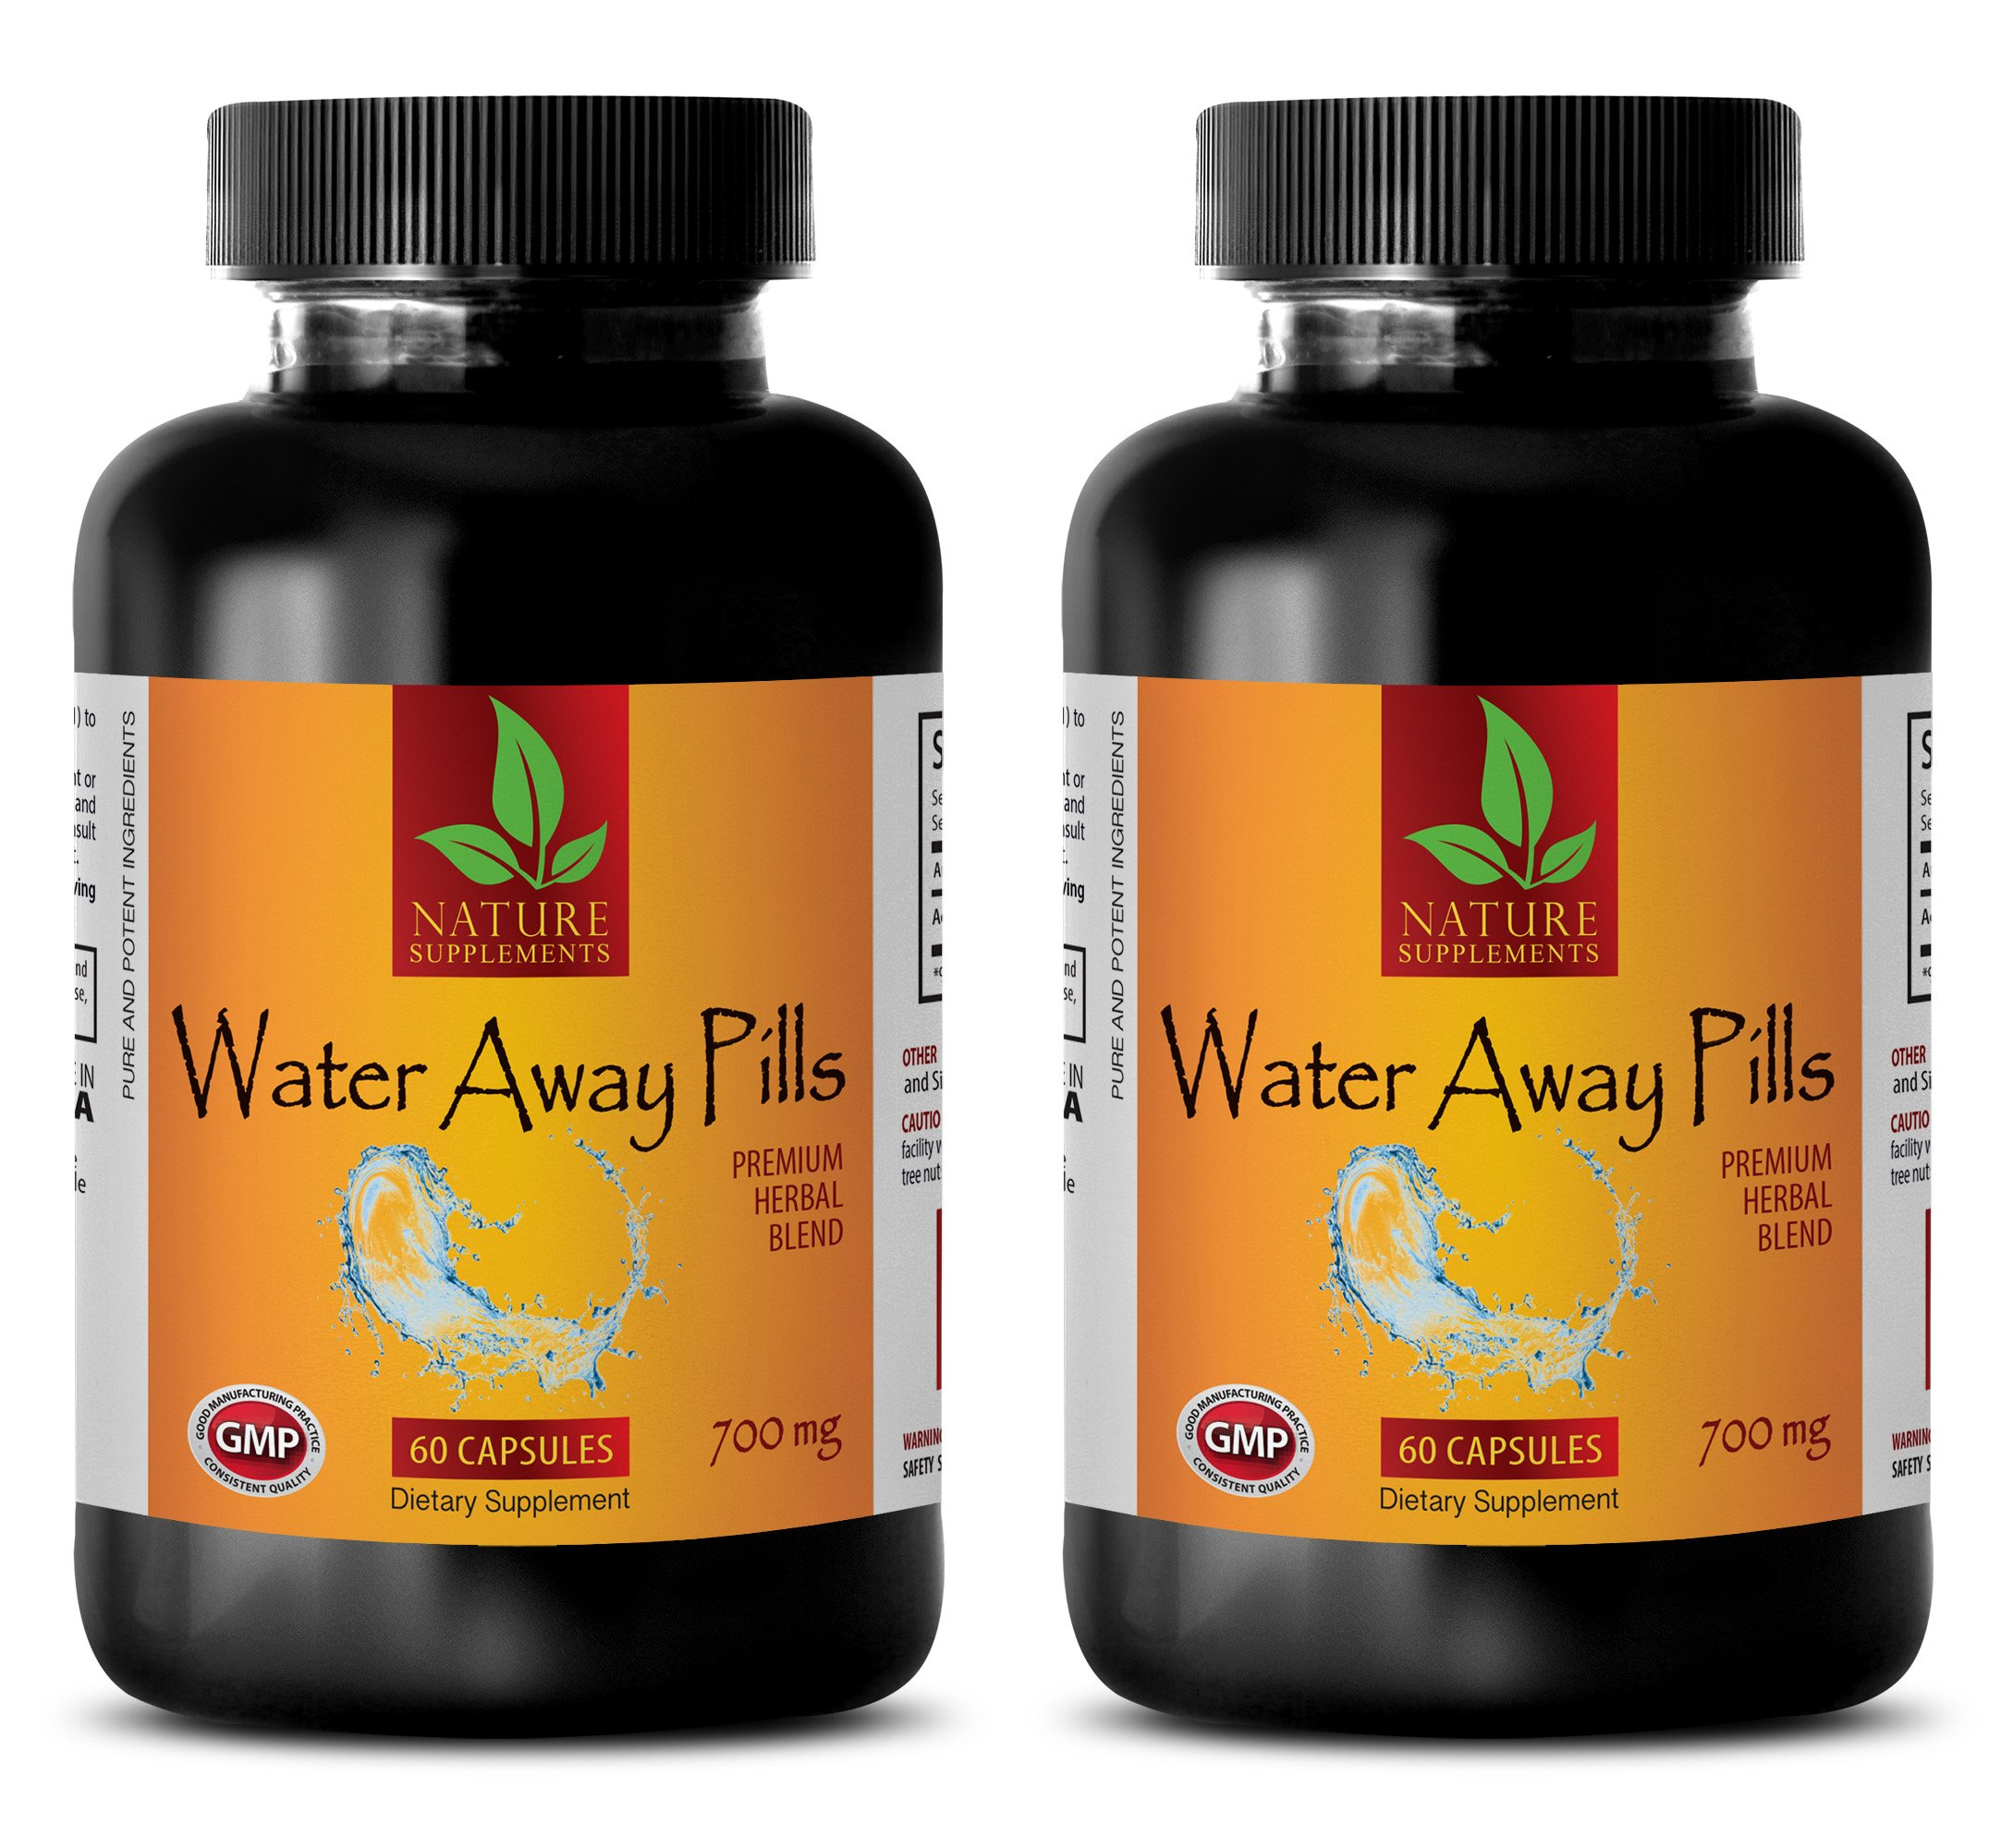 metabolism accelerator - WATER AWAY PILLS 700 Mg - PREMIUM HERBAL BLEND - immune system defense - 2 Bottles (120 Capsules)